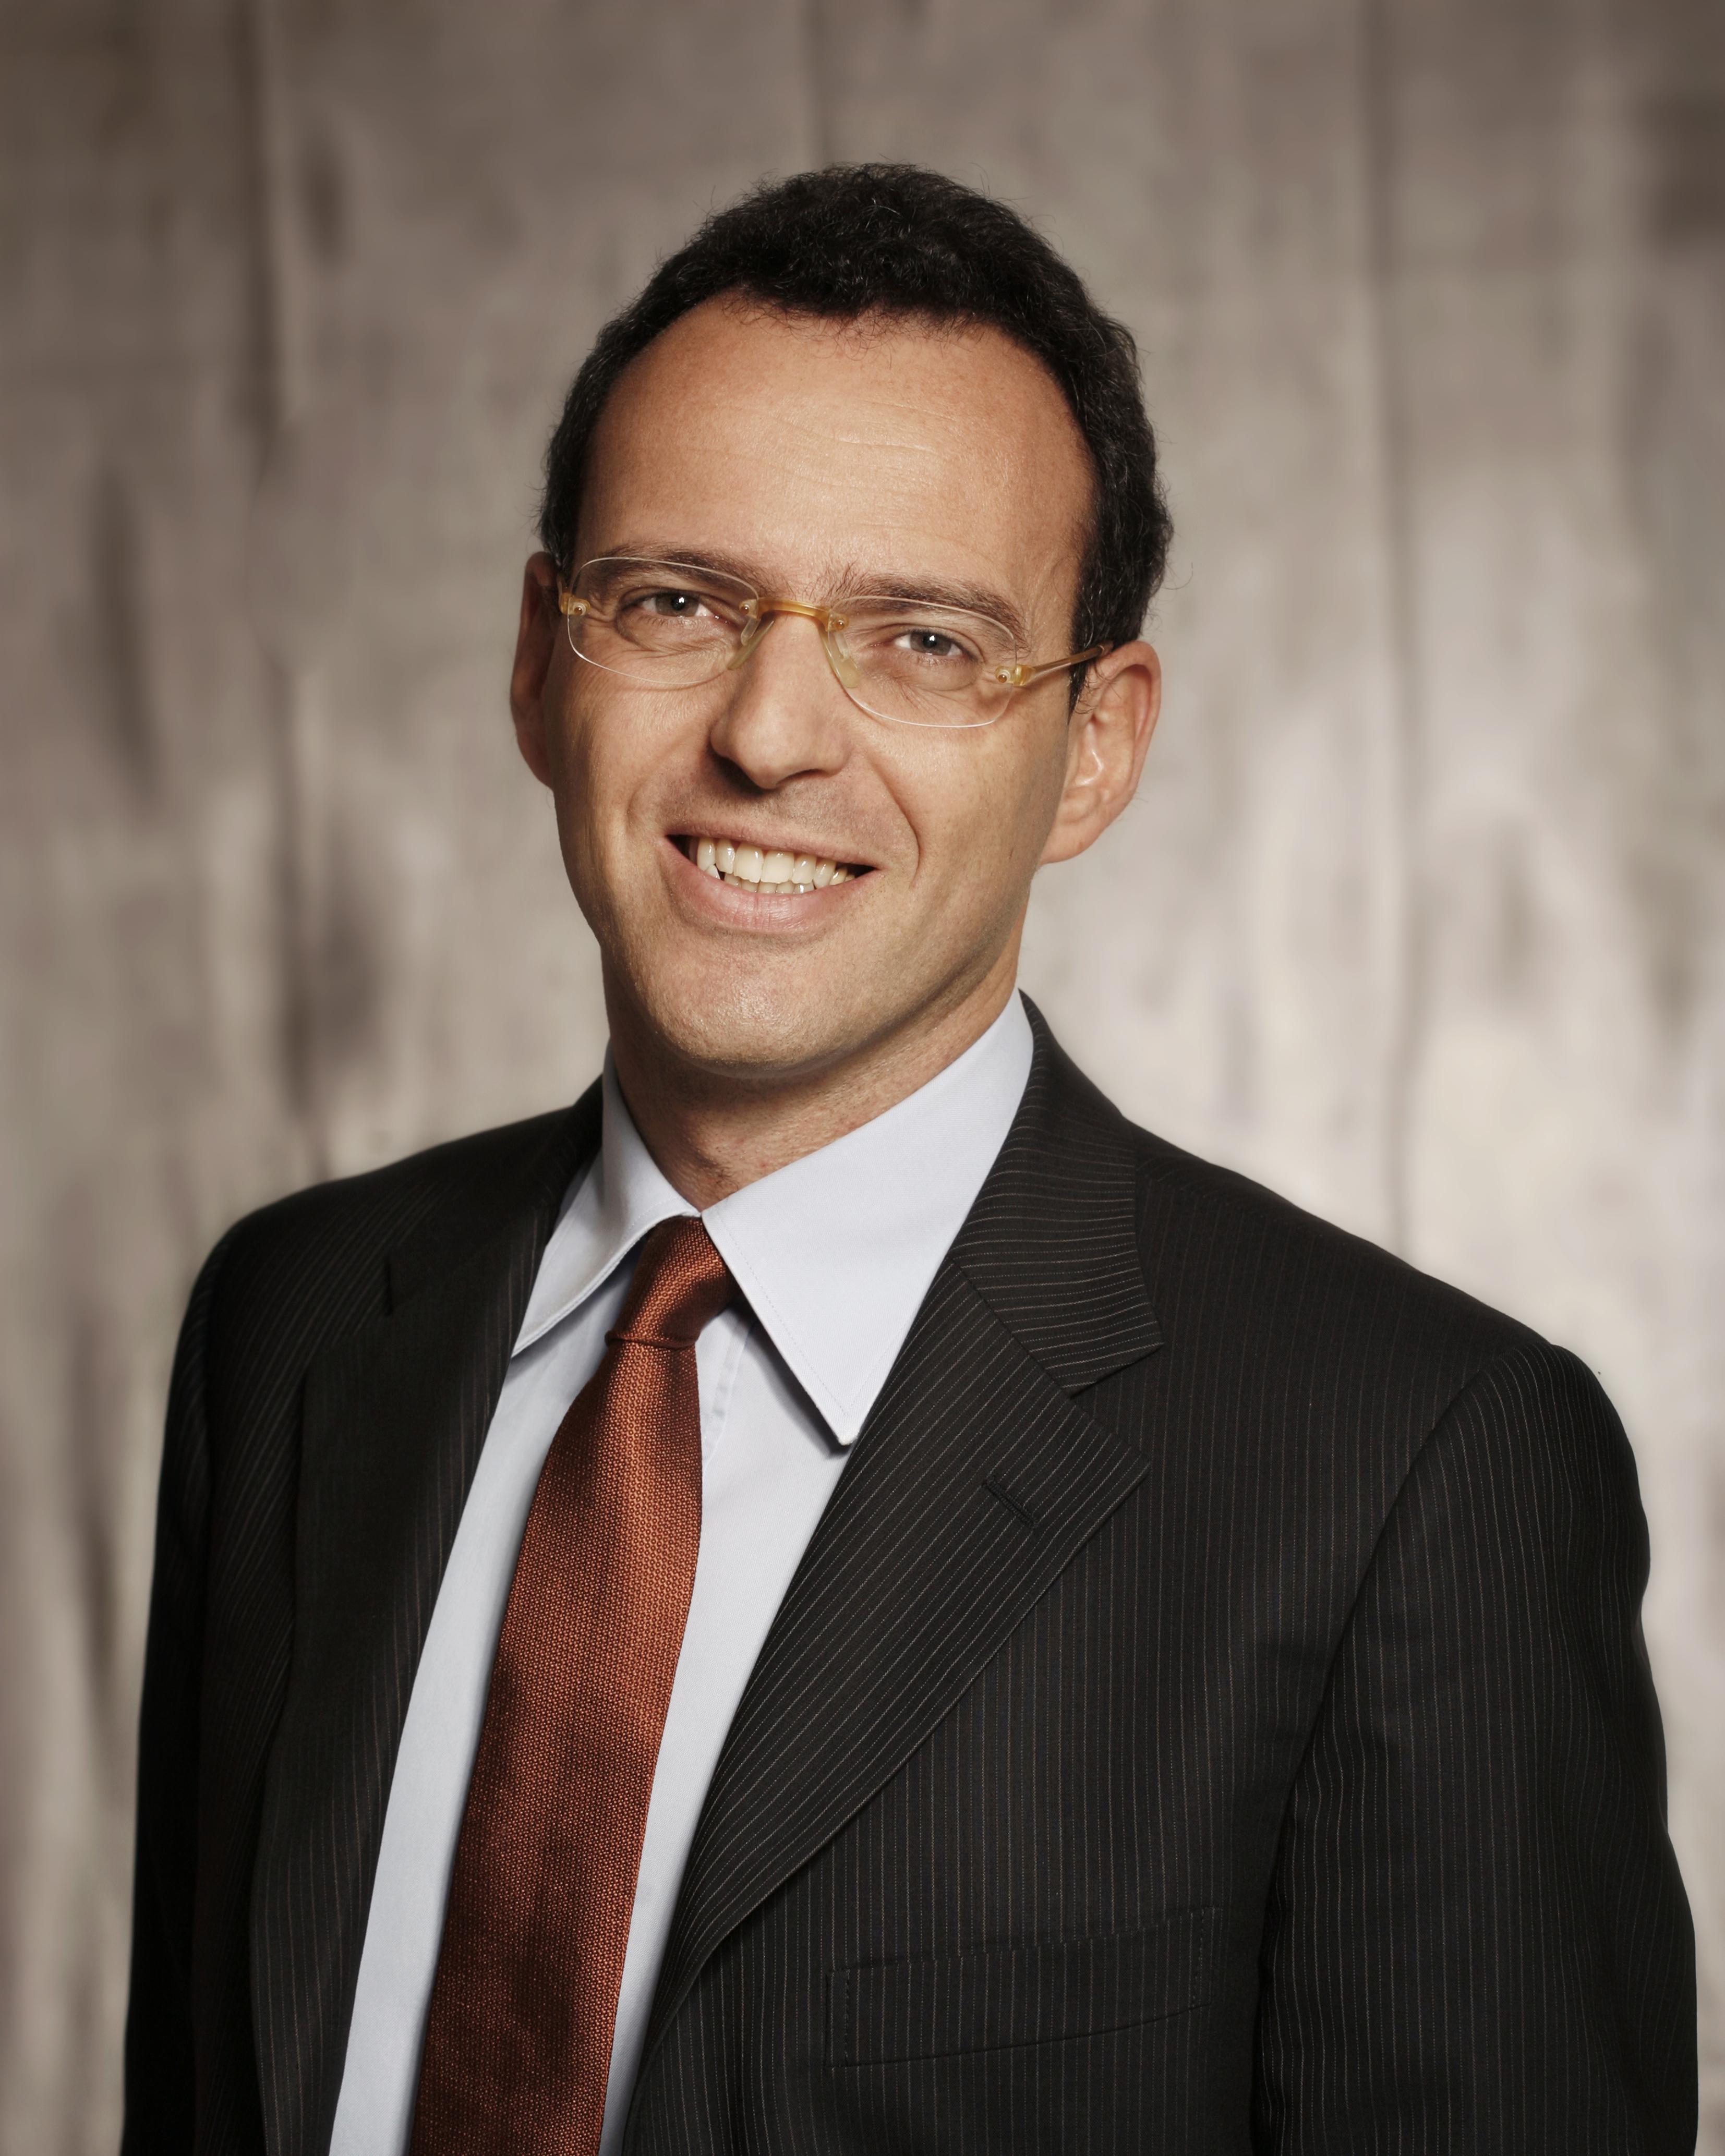 ANDREA CABRINI - Funding & Capital Markets Forum